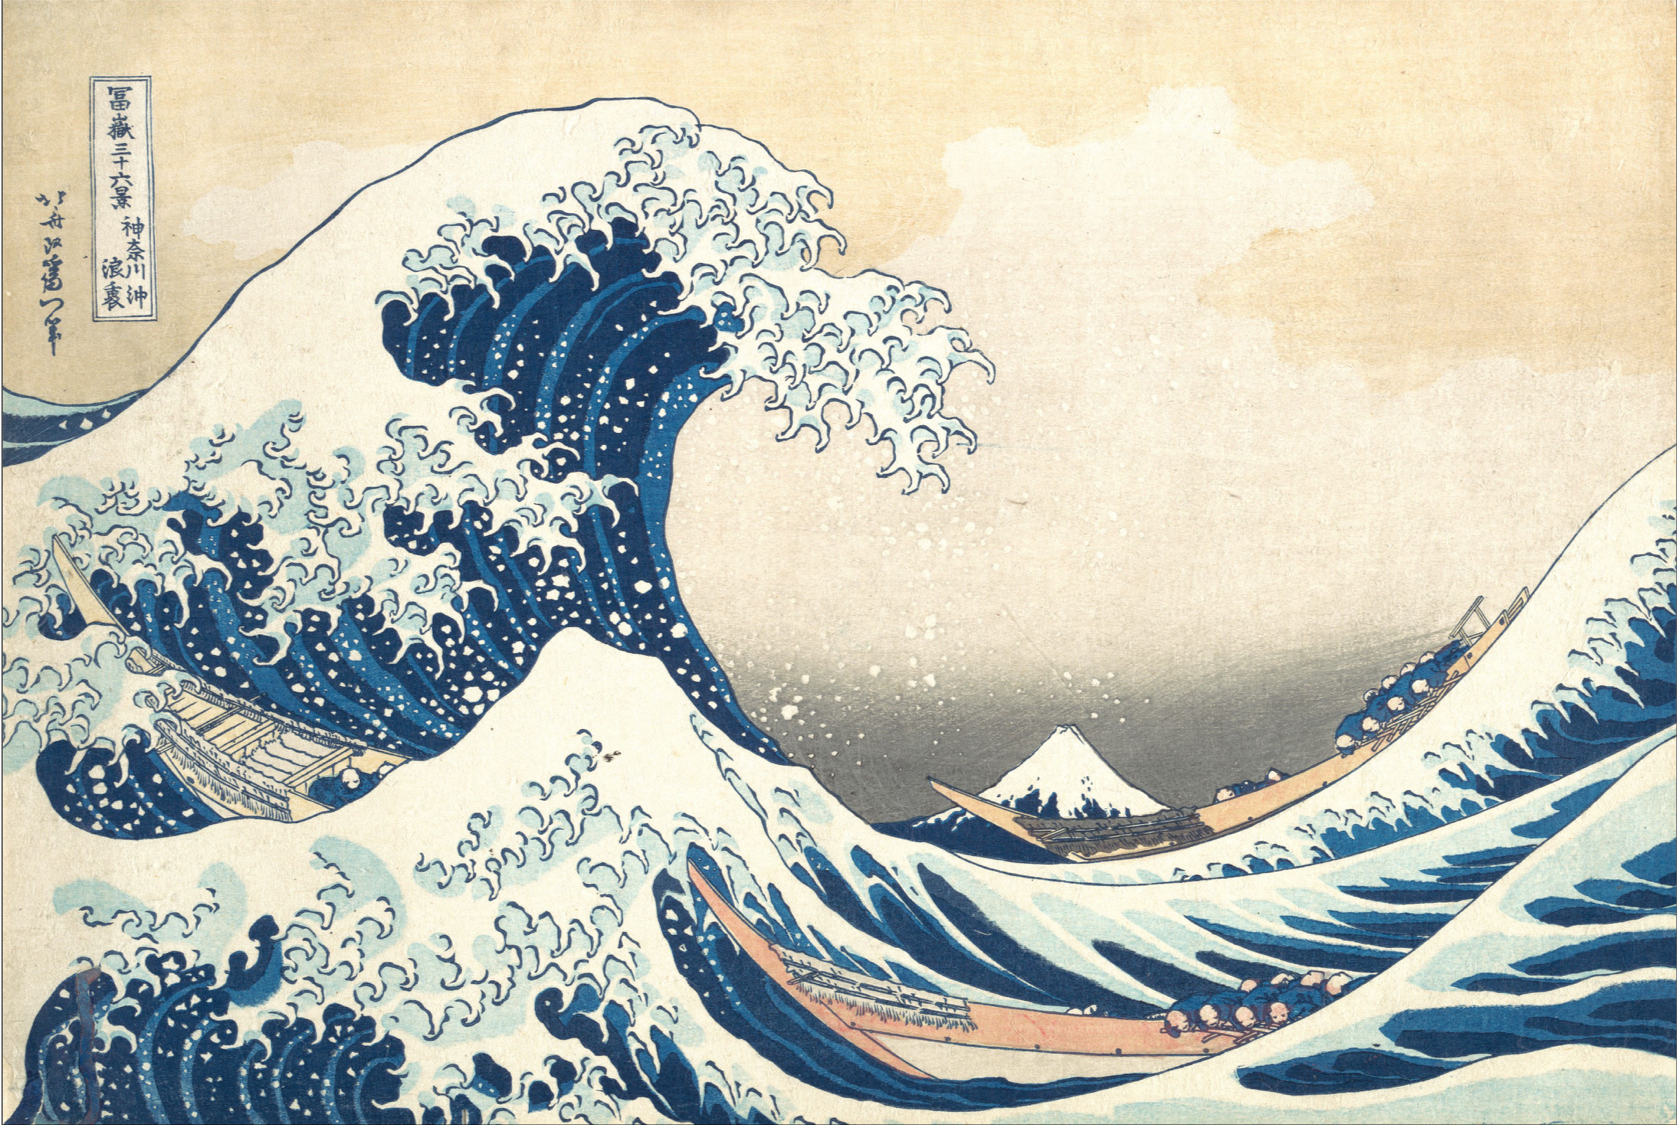 Katsushika Hokusai's iconic woodblock print The Great Wave off Kanagawa